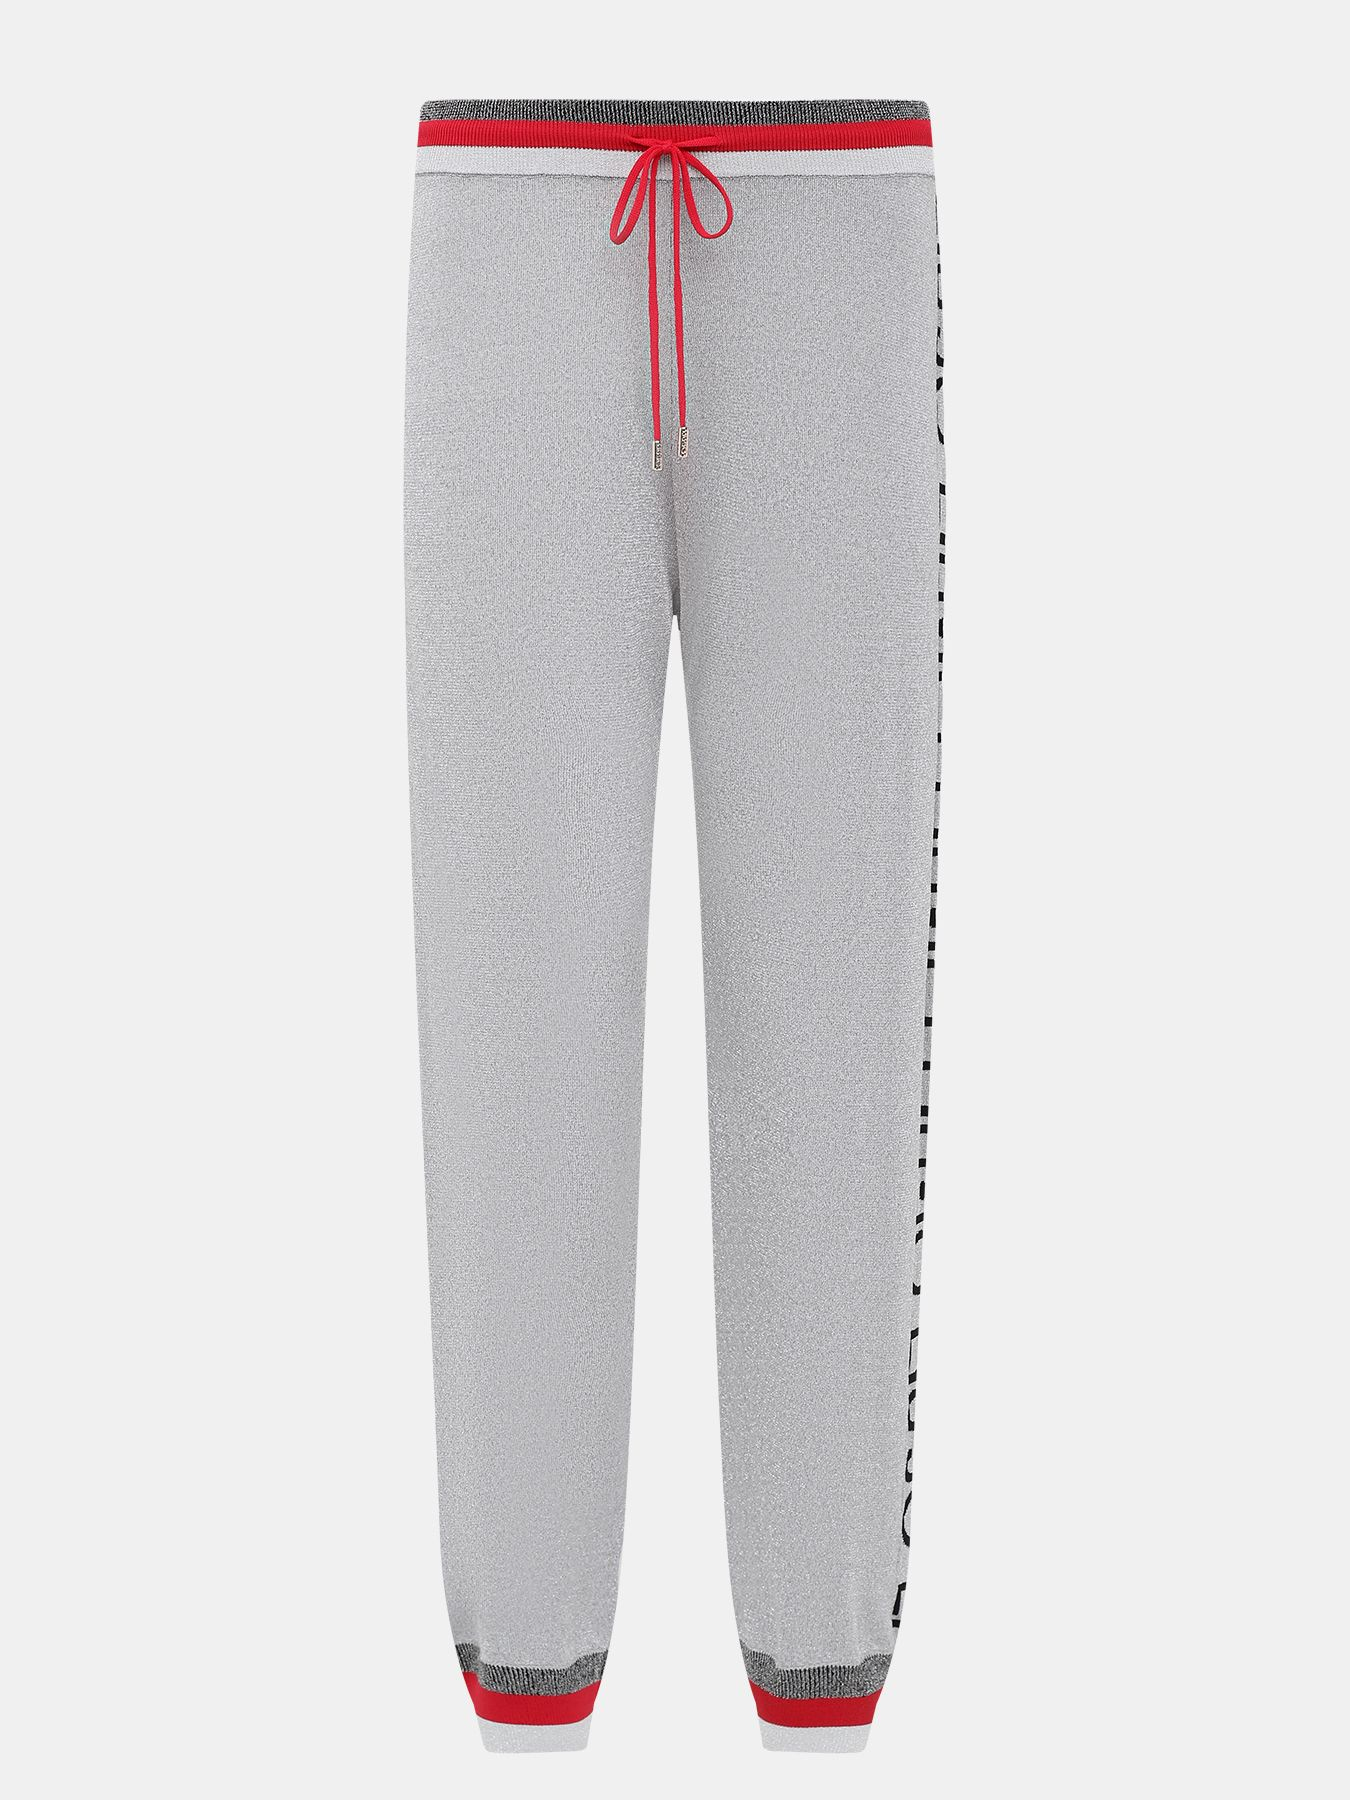 брюки liu jo sport брюки Спортивные брюки Liu Jo Sport Спортивные брюки